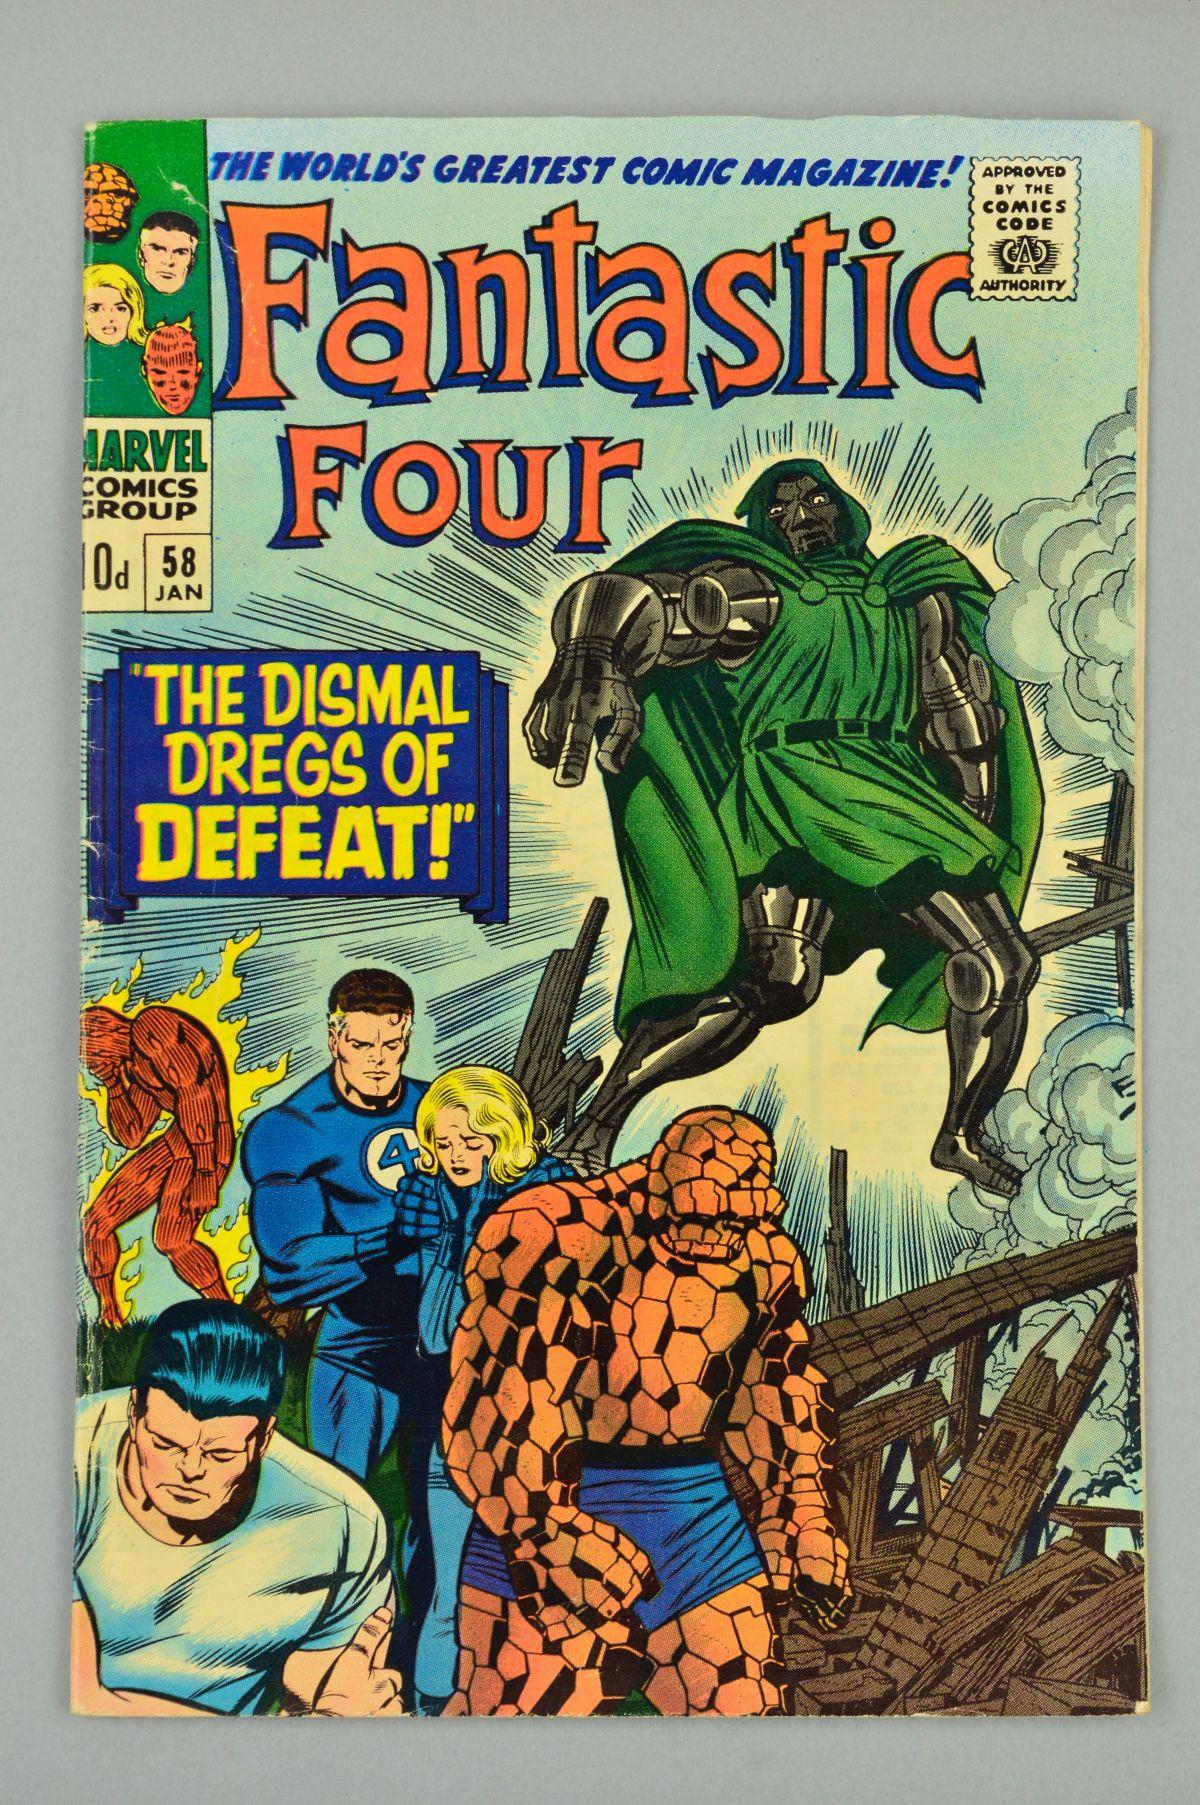 Lot 1853 - Fantastic Four (1961) #58, Published:January 10, 1967